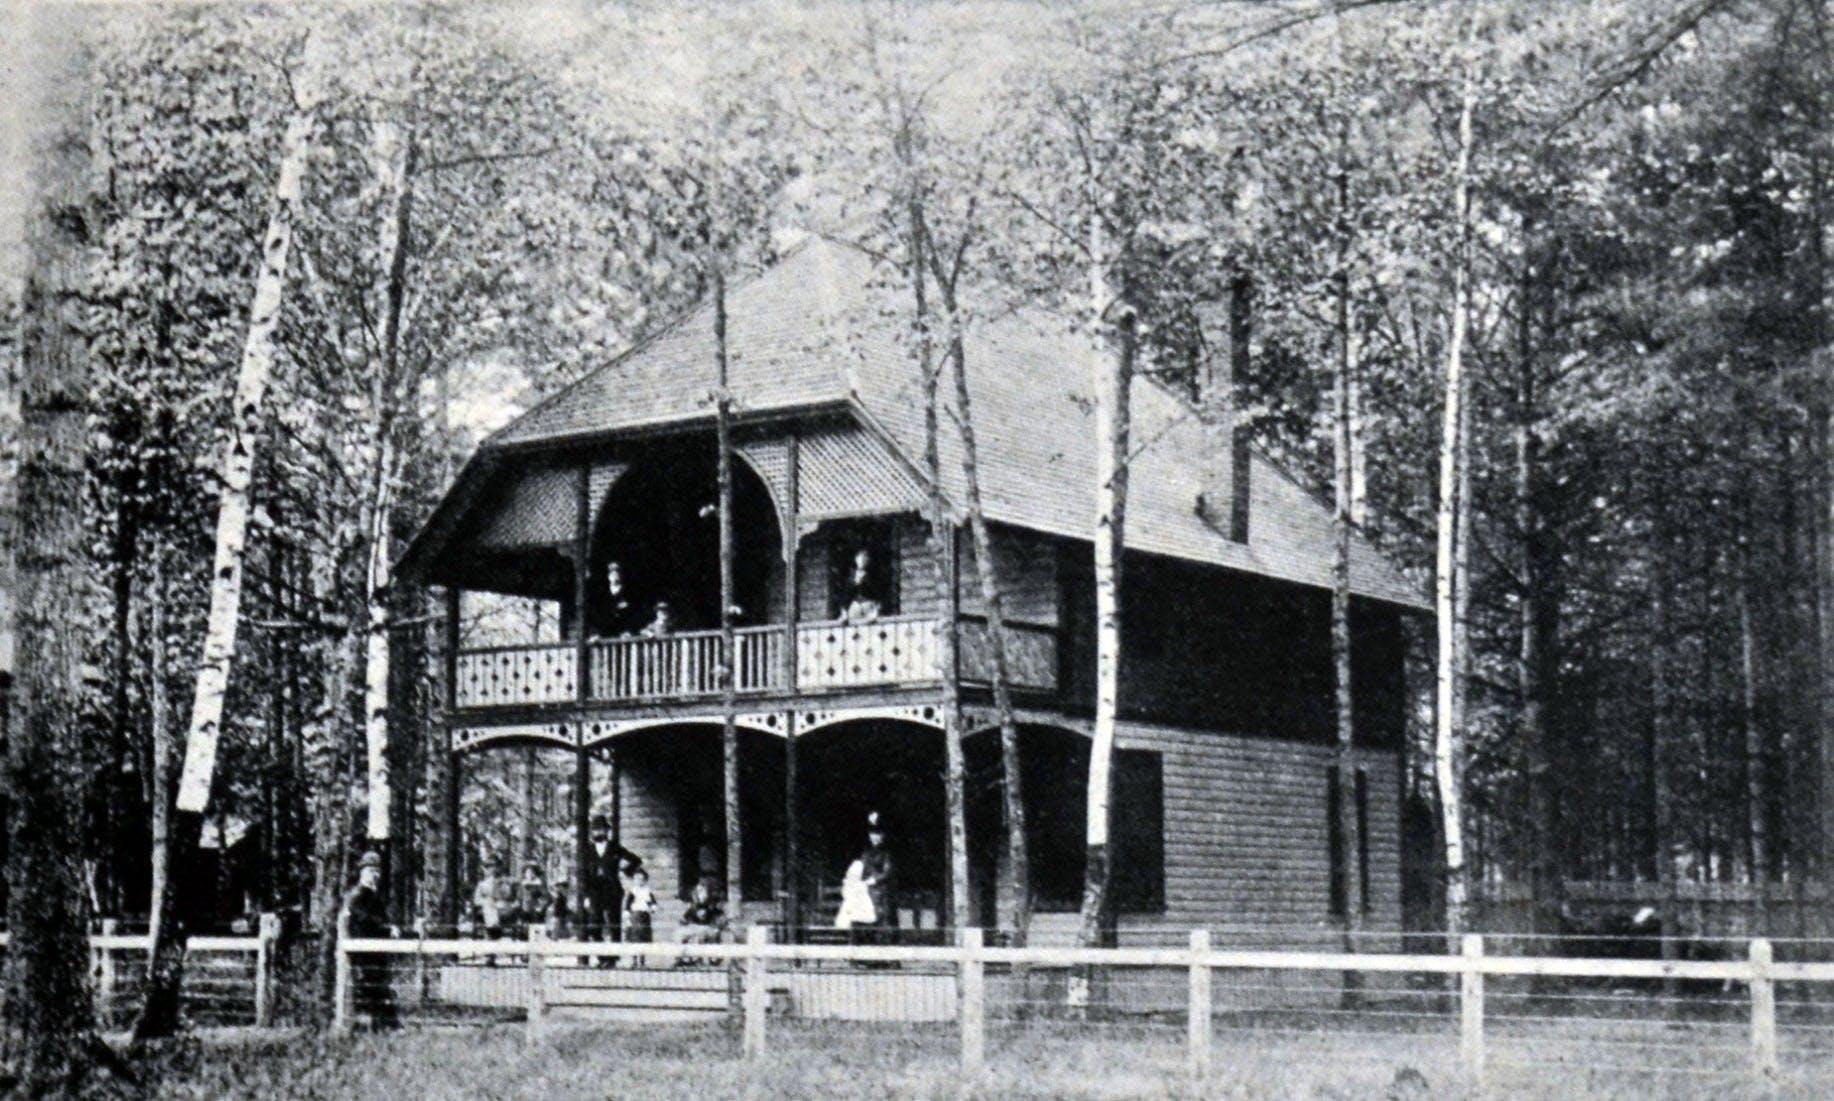 Berwyn Cottage, Davis Residence, circa 1900